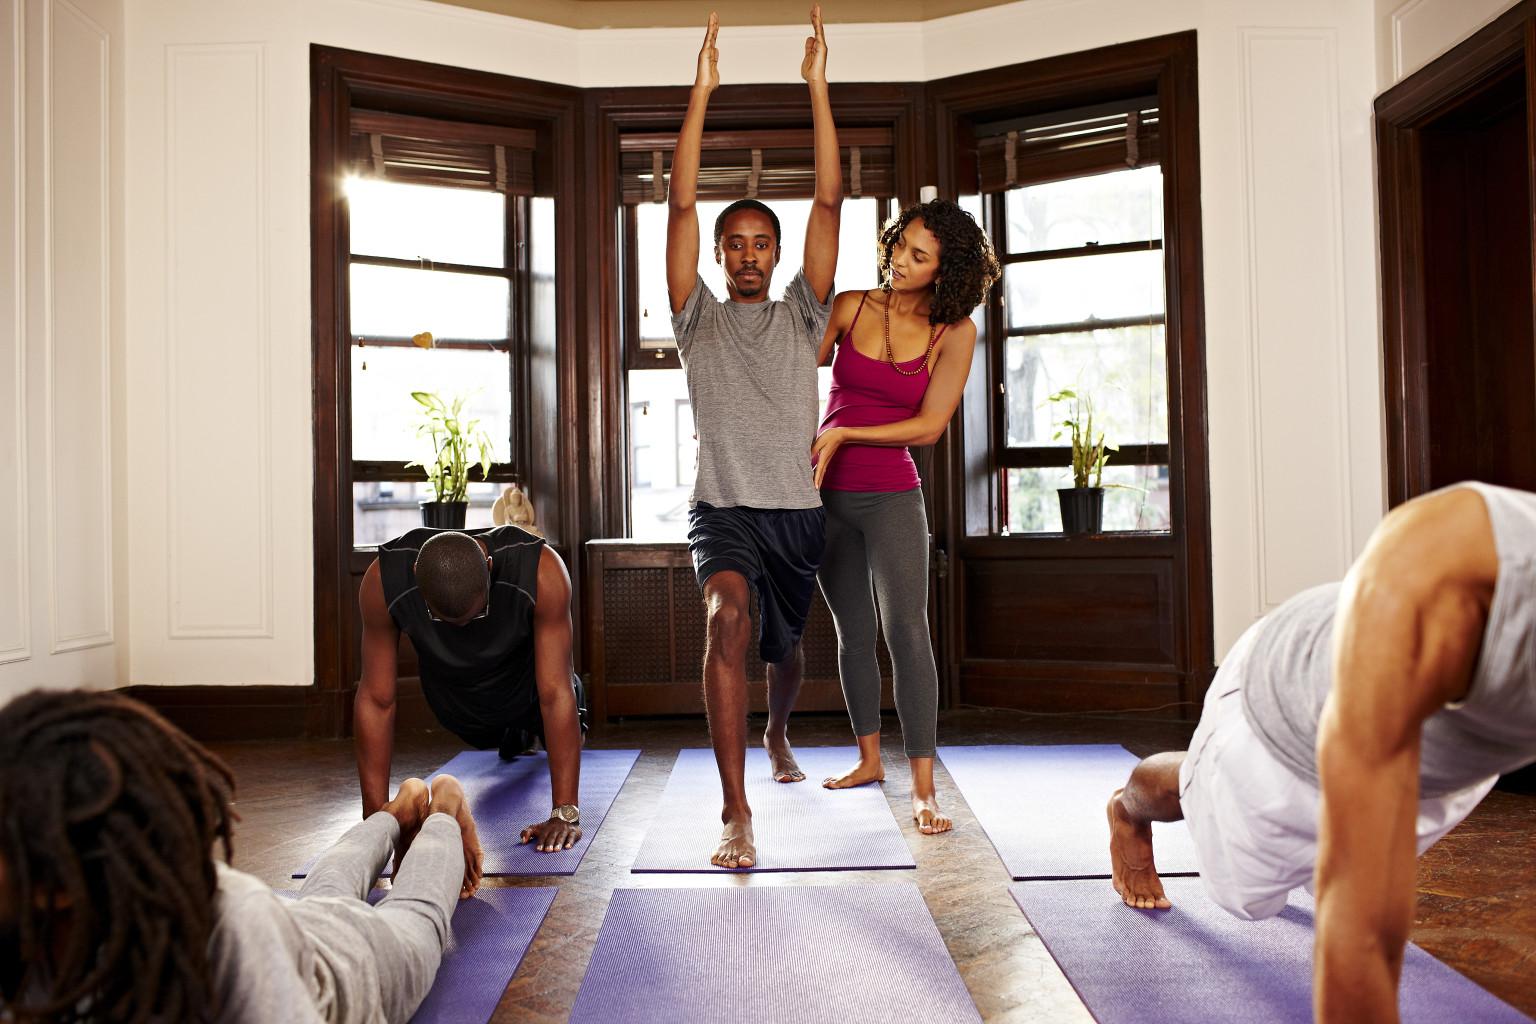 Why Men Should Practice Yoga